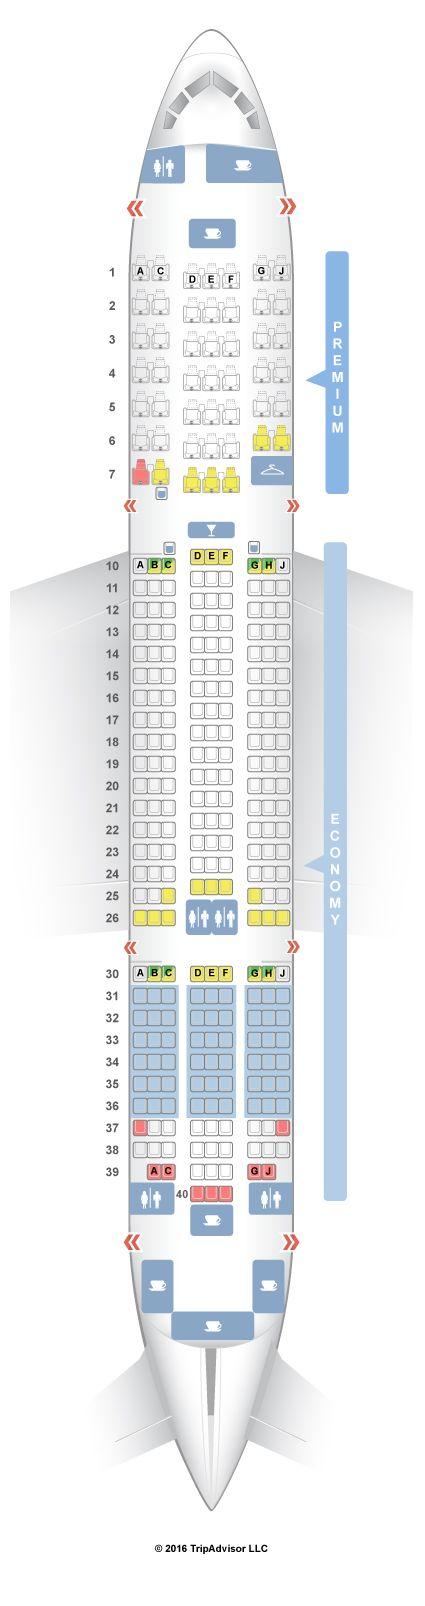 SeatGuru Seat Map Thomson Boeing 787-8 (788) - SeatGuru